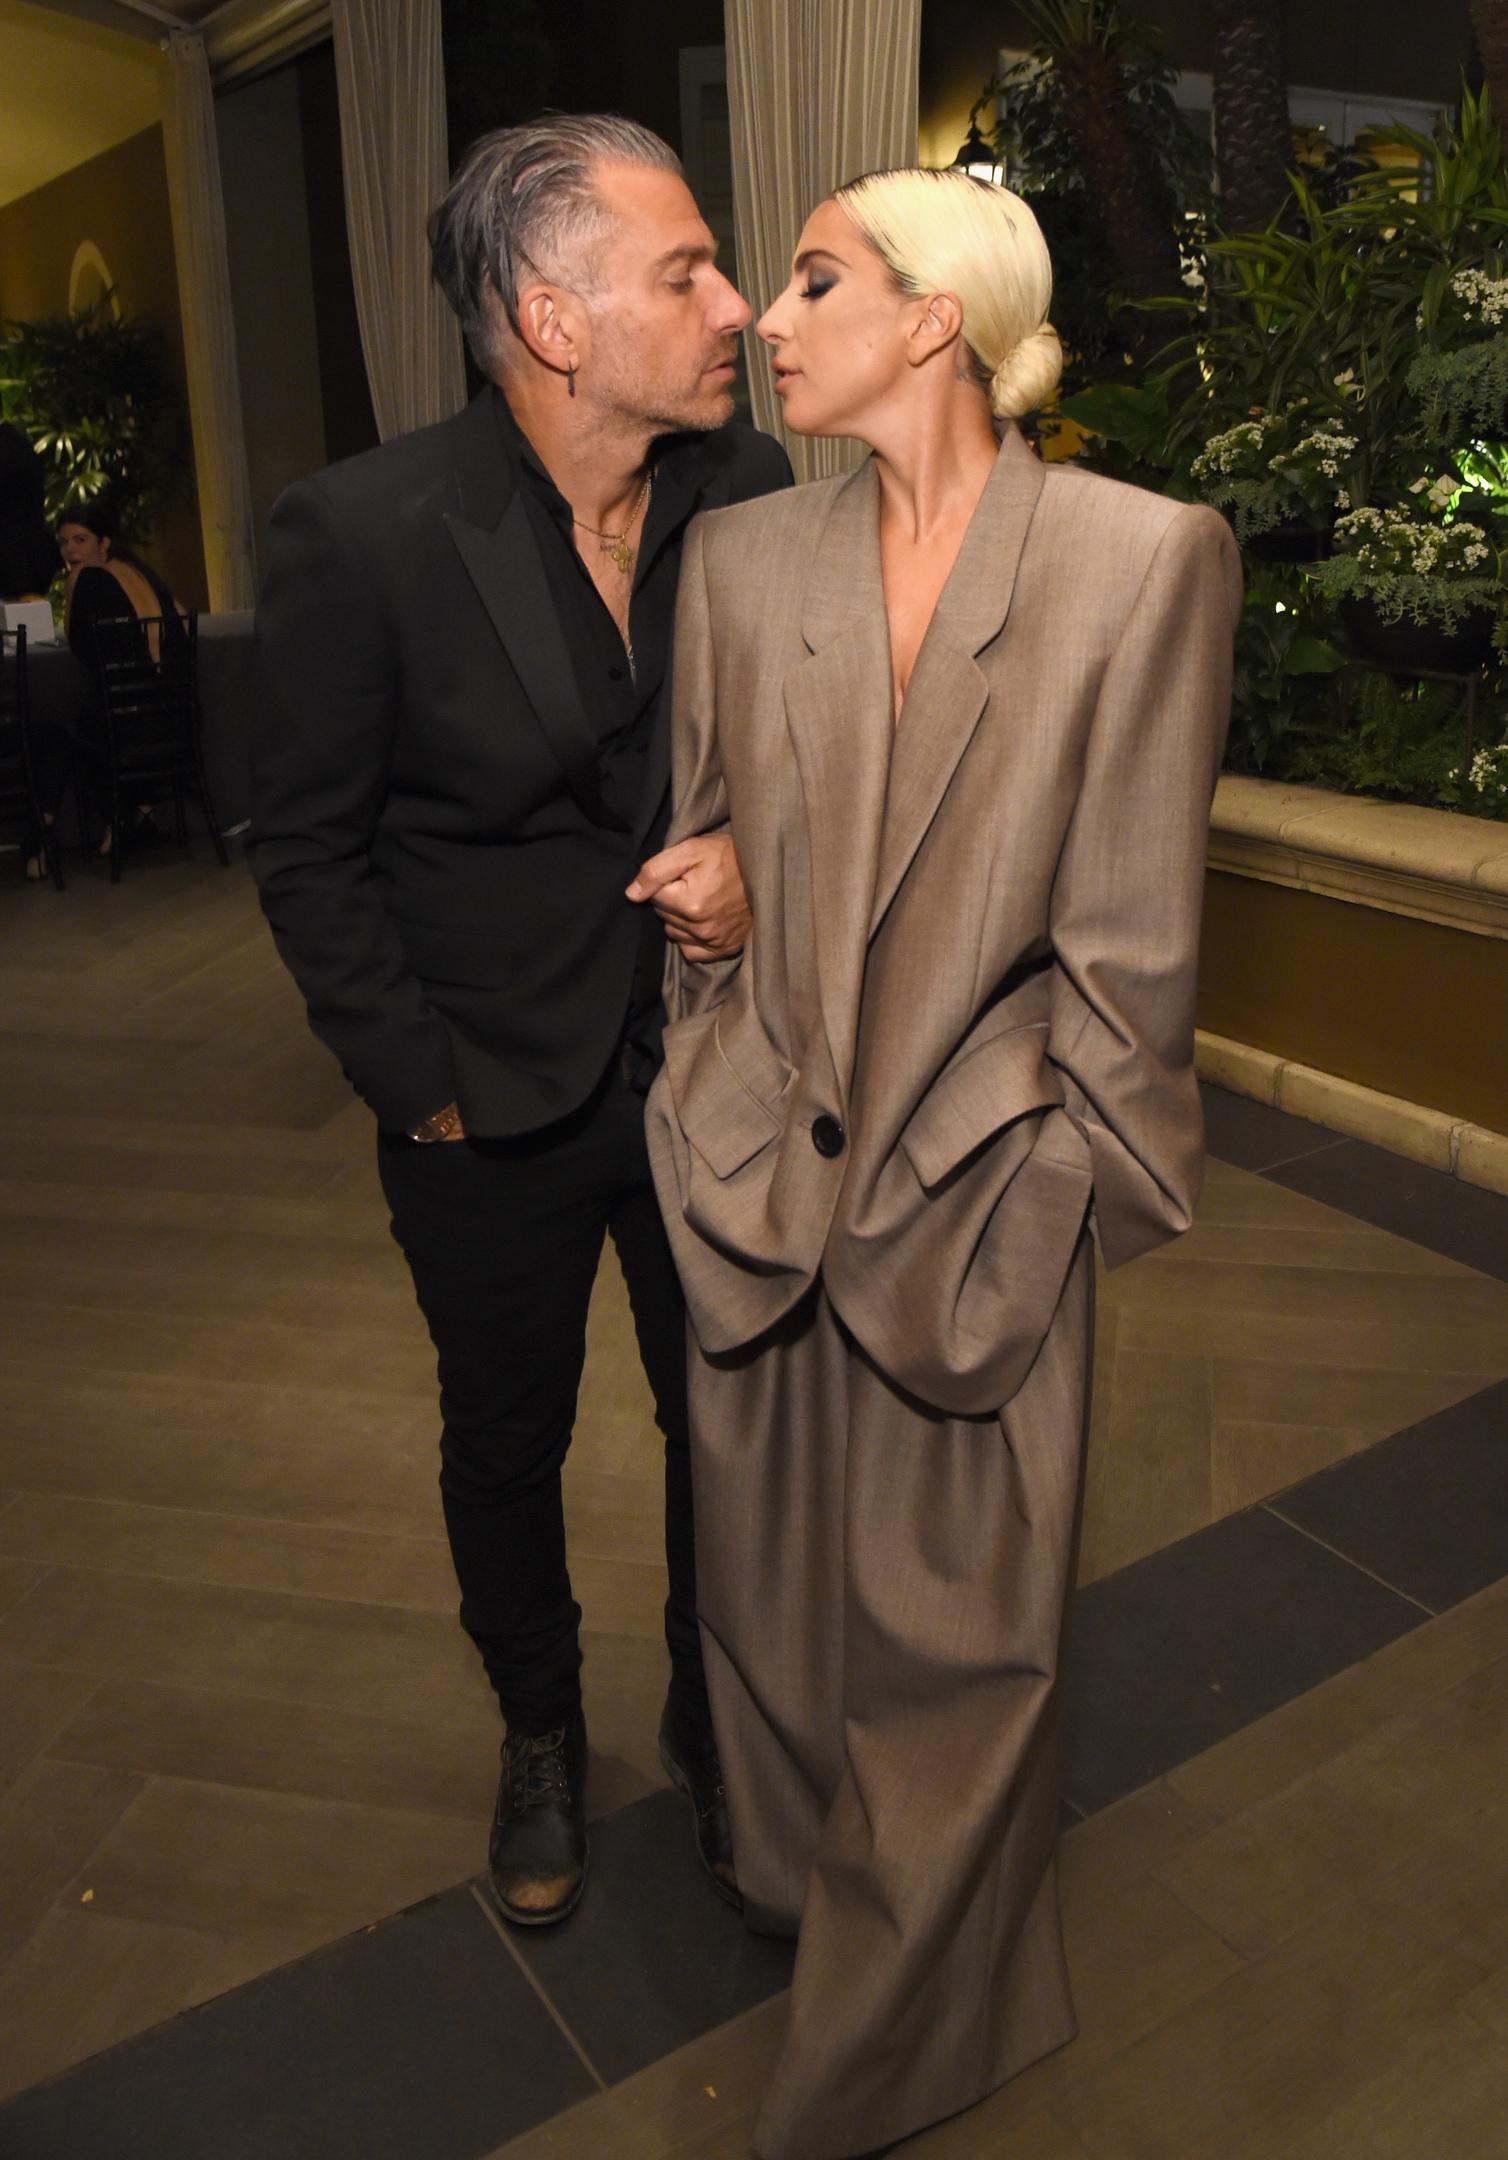 Леди Гага выходит замуж за менеджера Кристиана Карино: фото